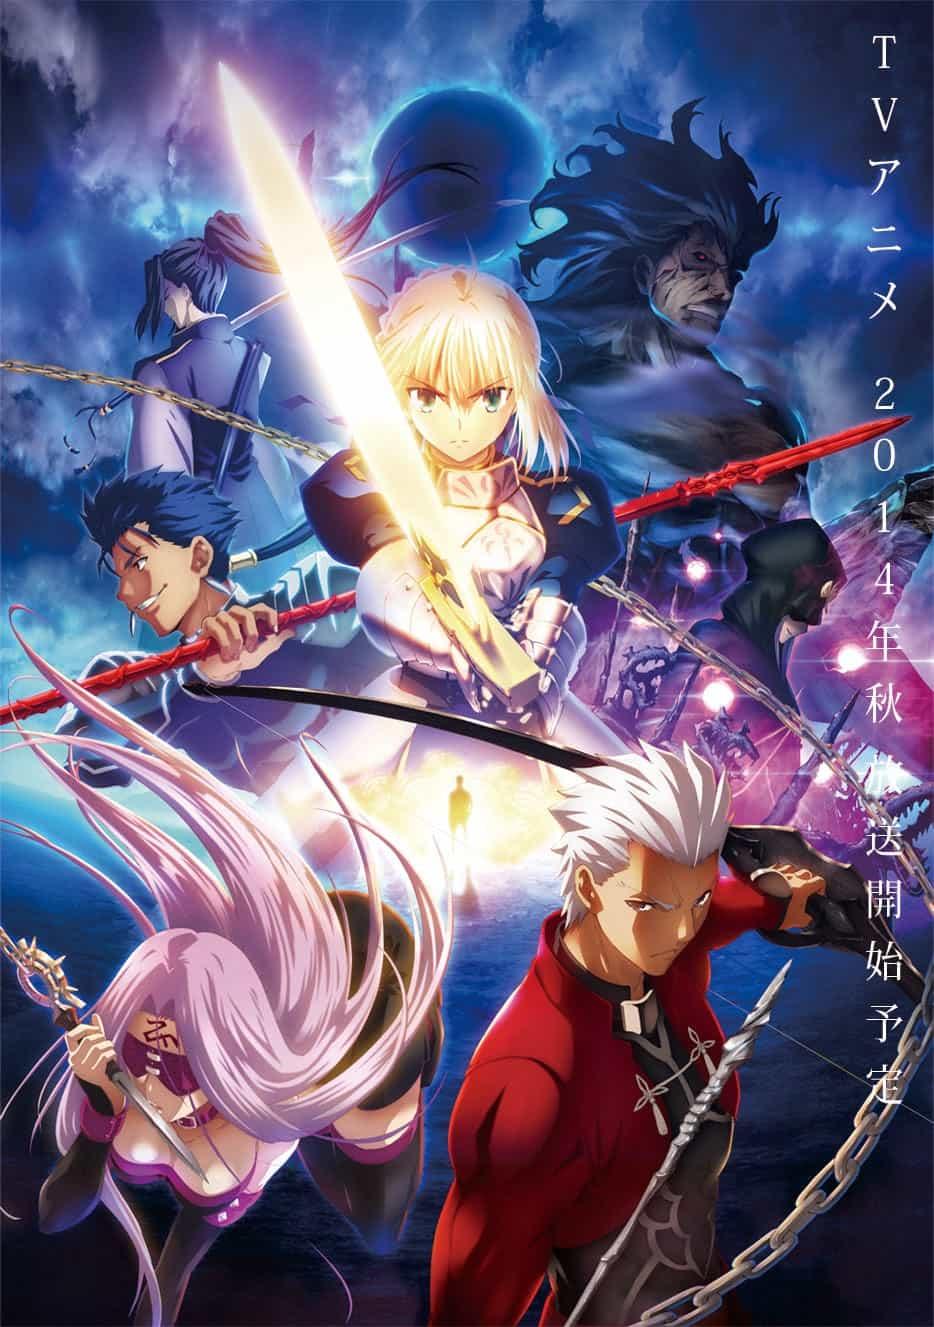 Fate-Zero-ปฐมบทสงครามจอกศักดิ์สิทธิ์-พากย์ไทย